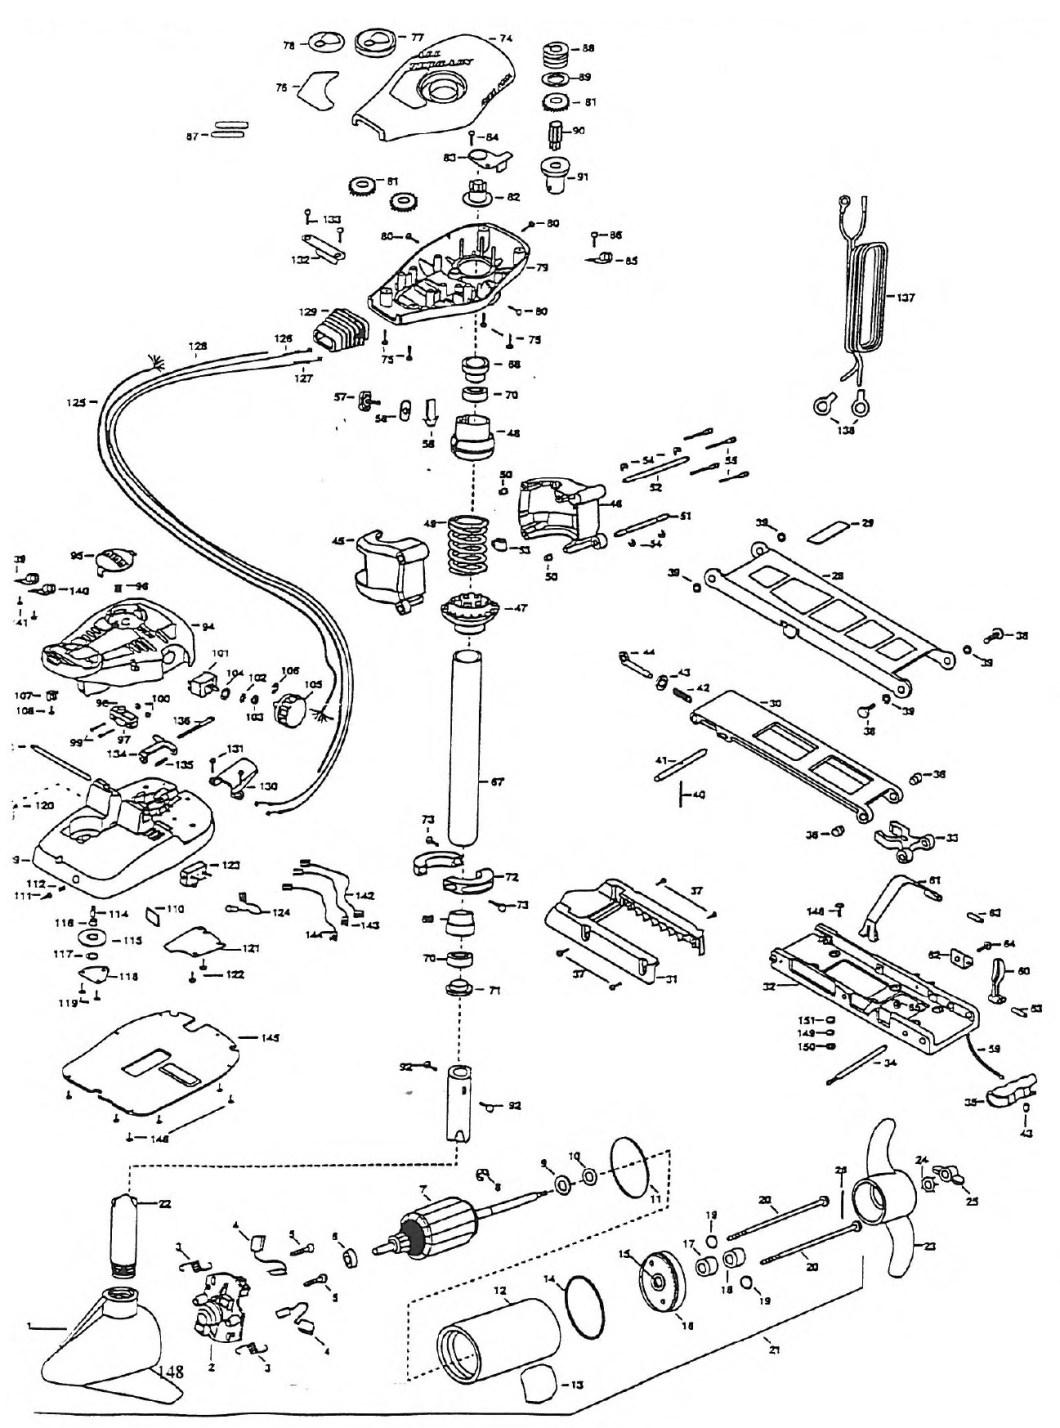 minn kota 330 wiring diagram